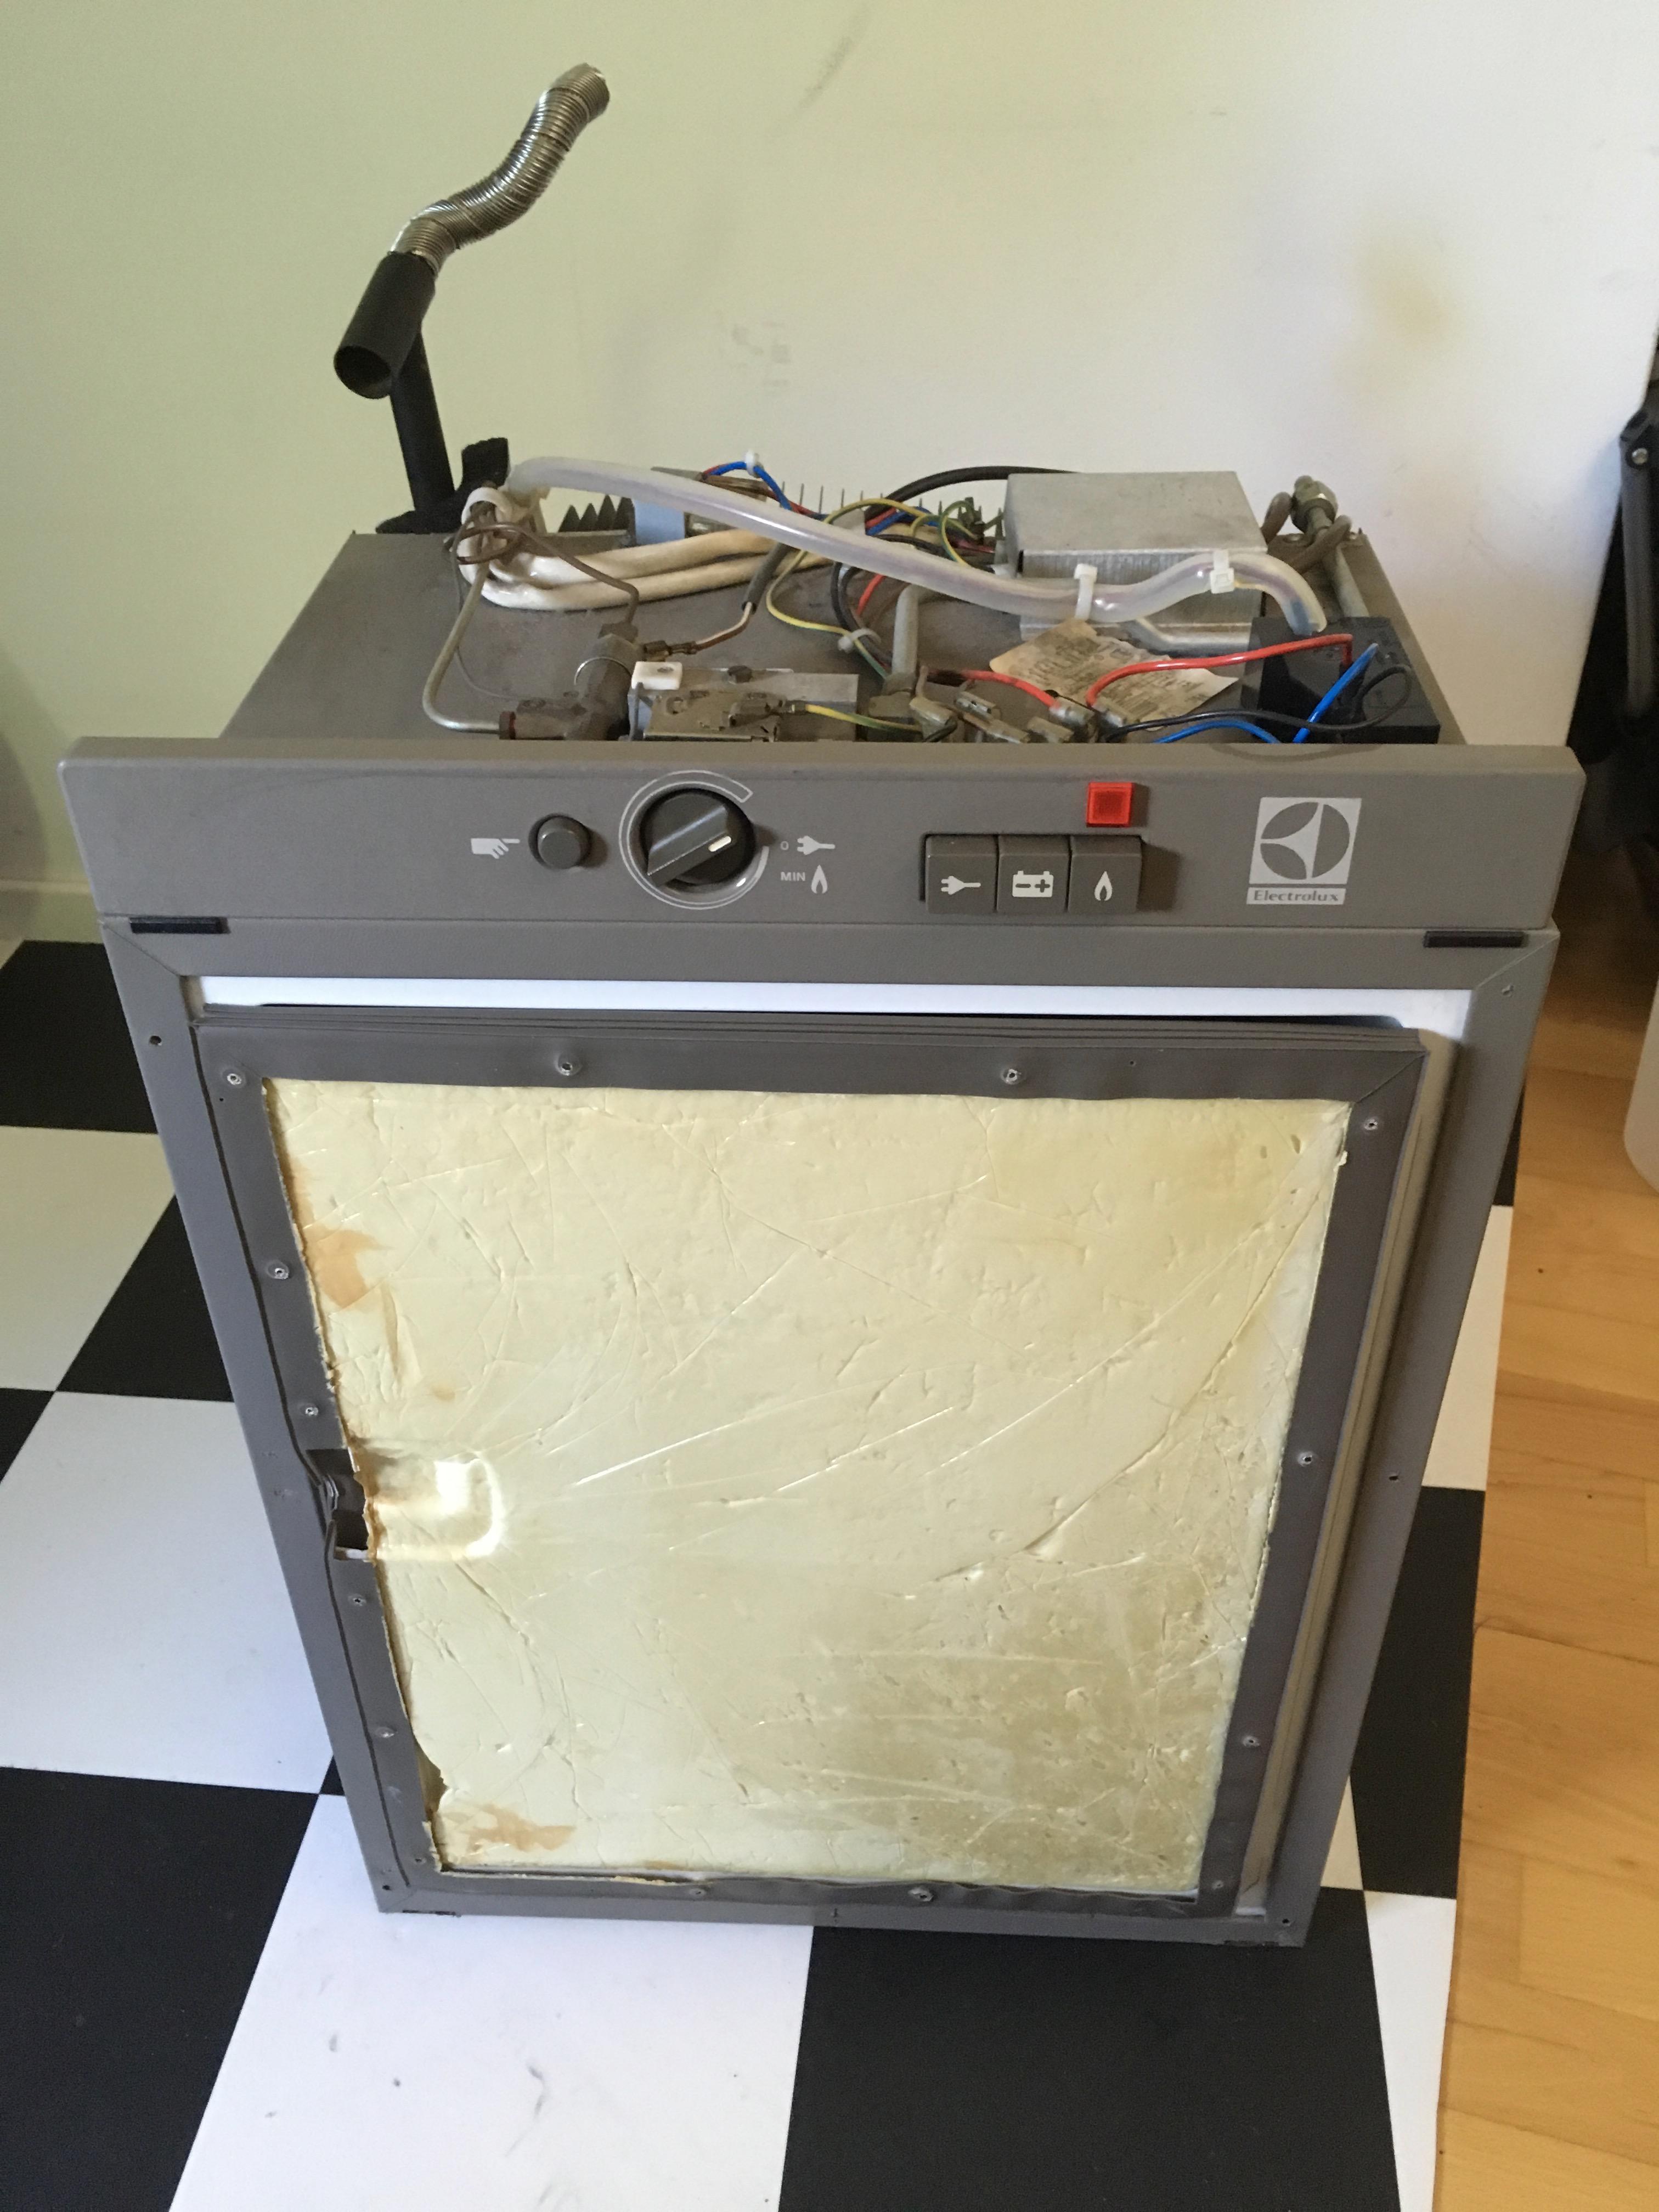 verkauft] Absorberkühlschrank Electrolux RM 184 EGI, Zündfunkengeber ...